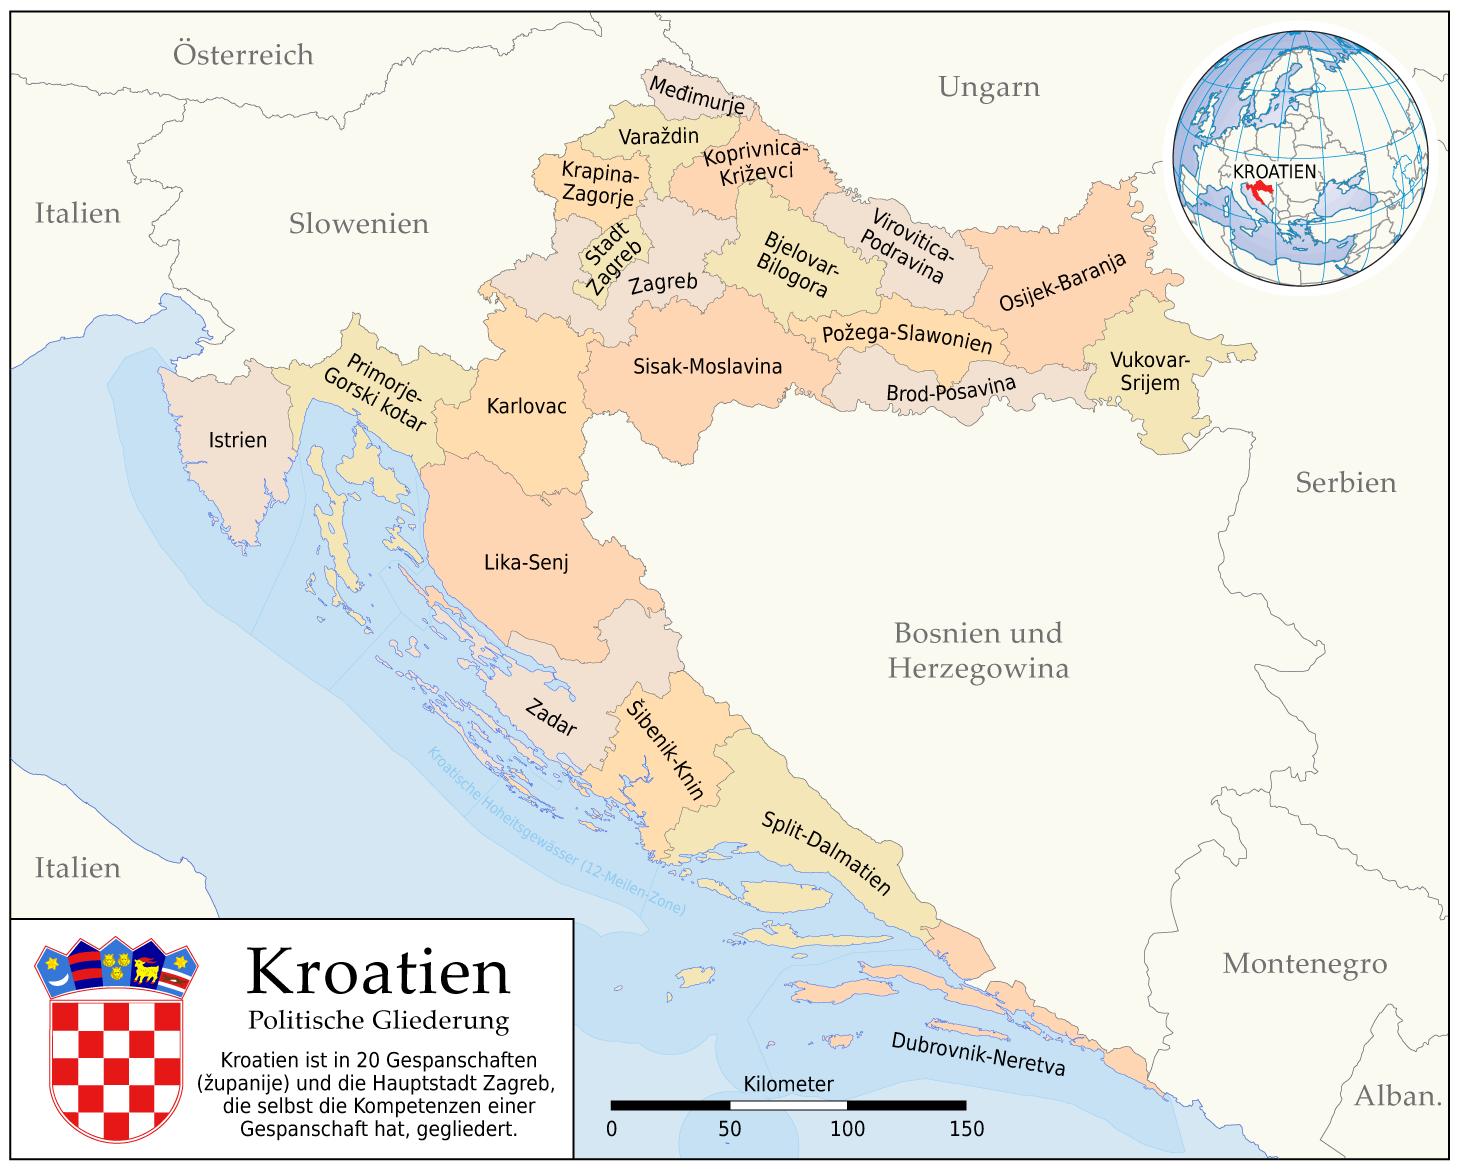 kroatien karte regionen Kroatien Karte Regionen kroatien karte regionen